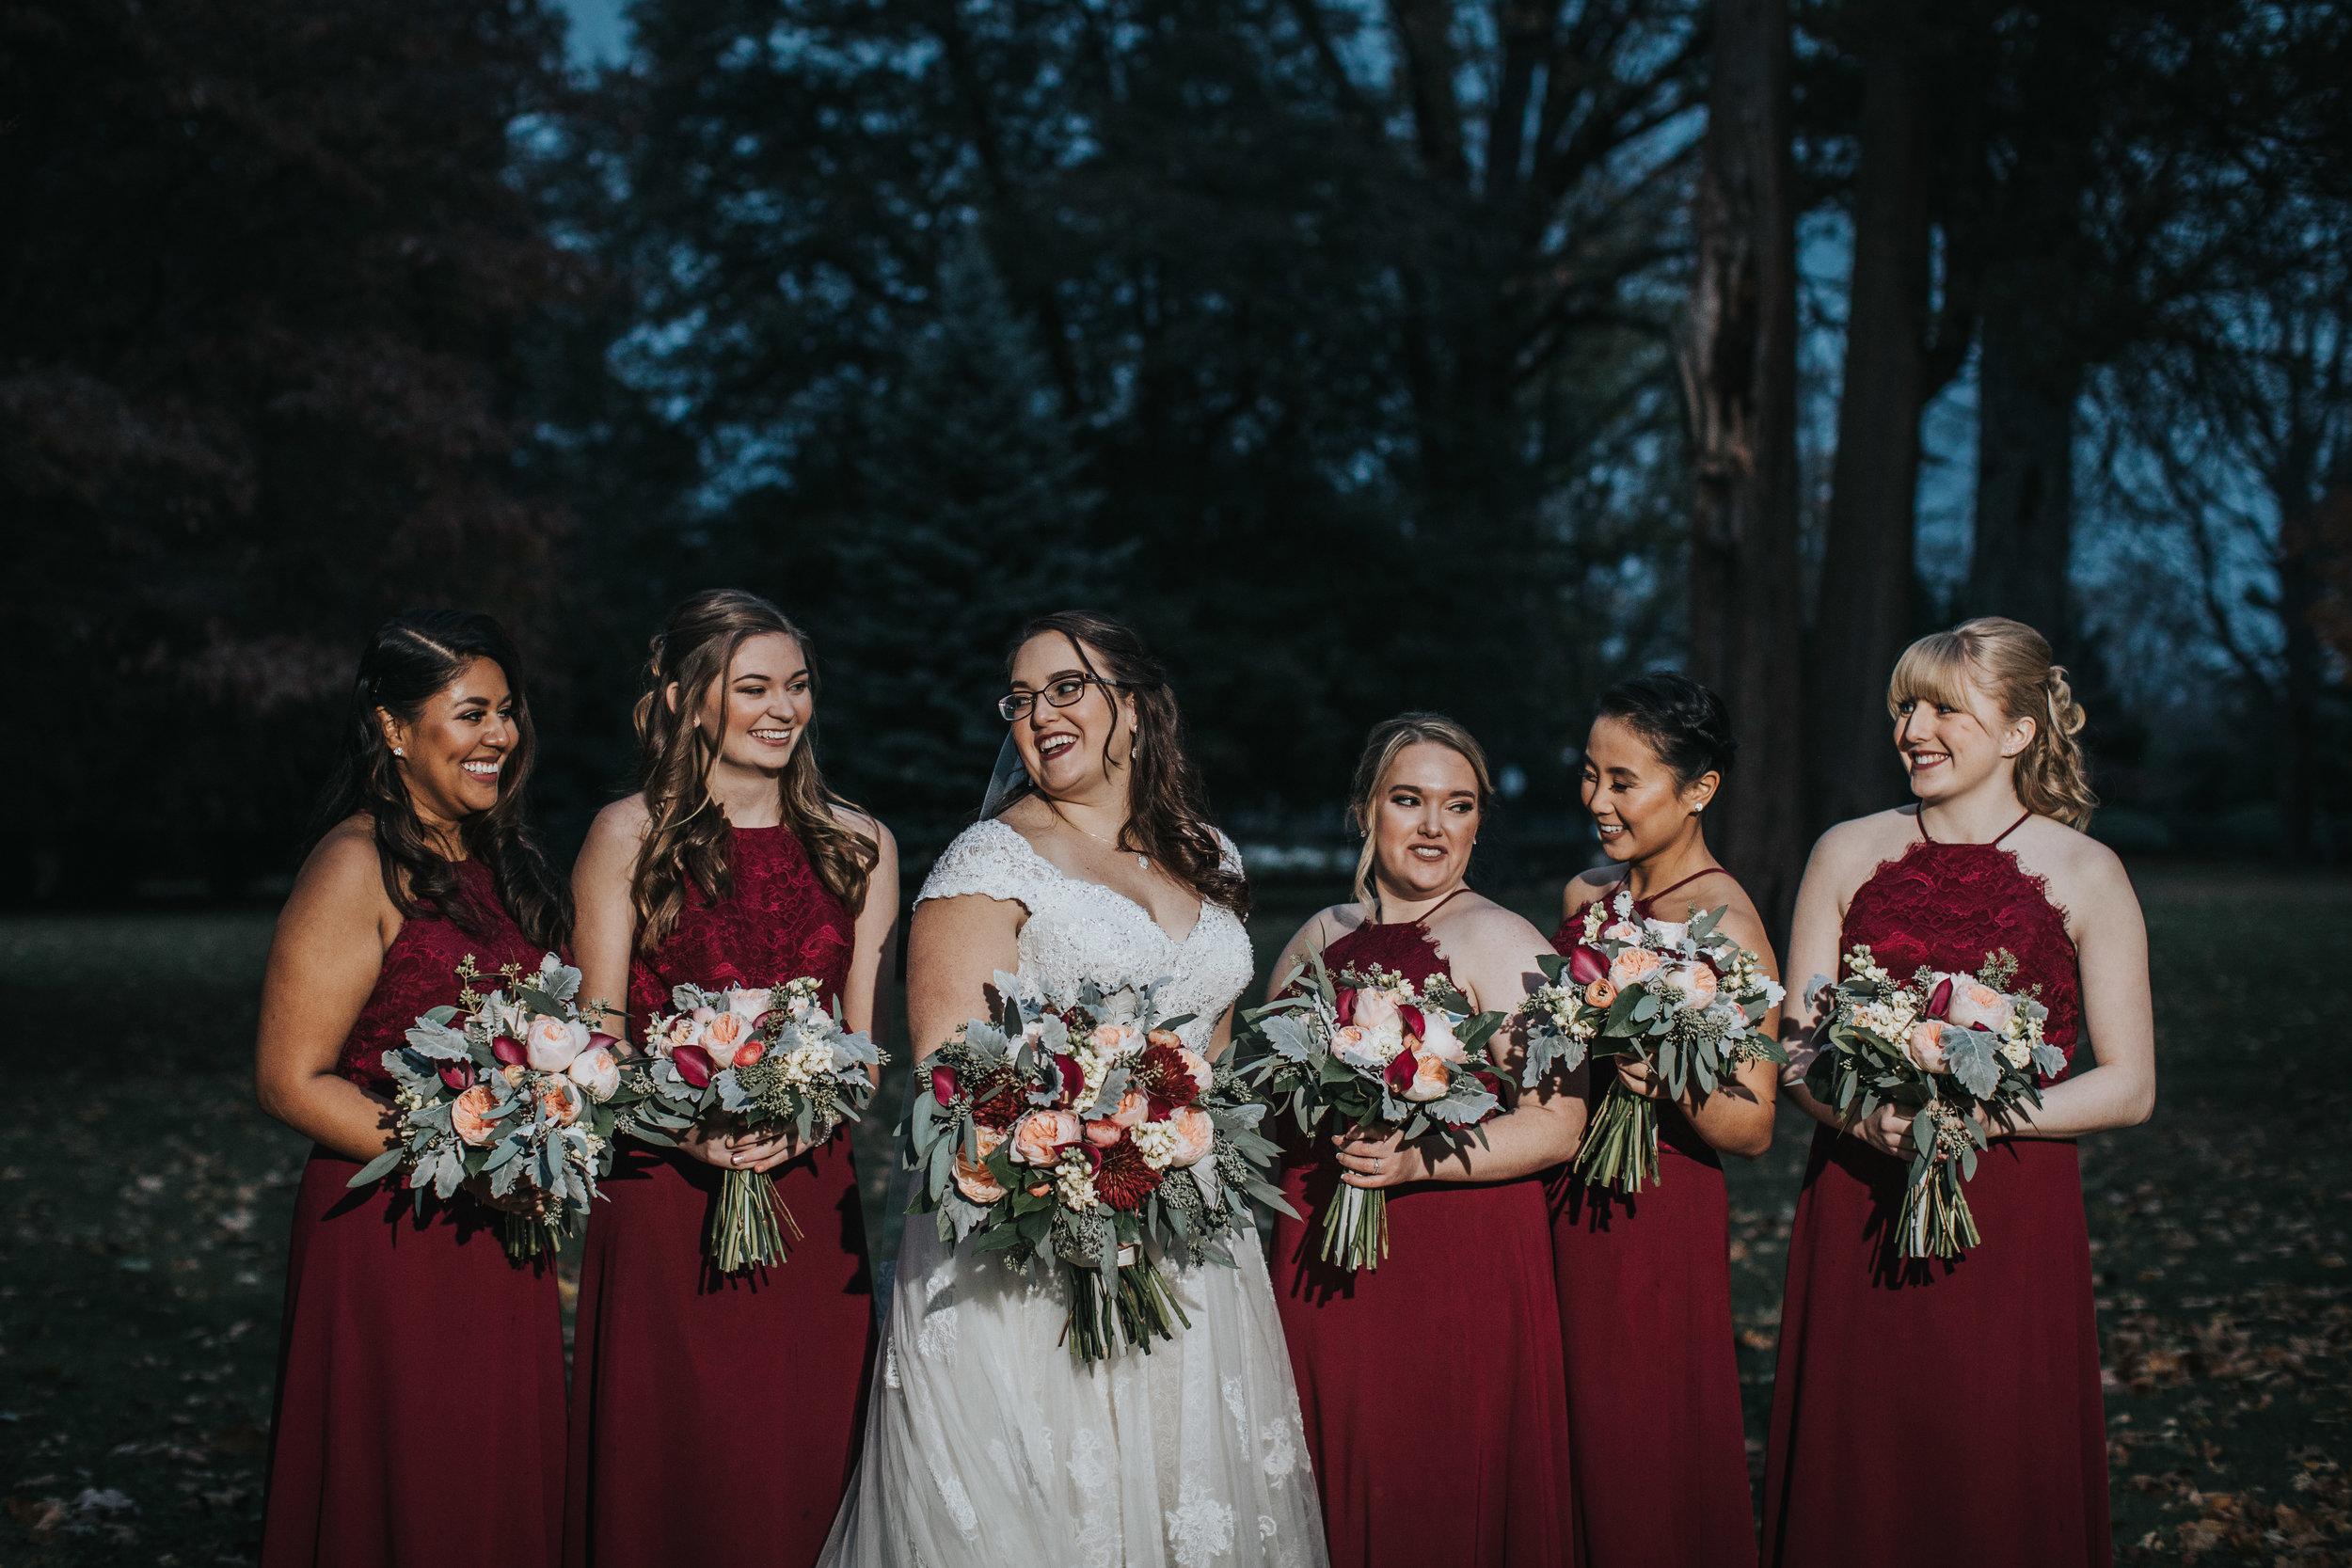 New-Jersey-Wedding-Photography-Fishers-Tudor-House-JennaLynnPhotography-BridalParty-Kathleen&Eddie-26.jpg